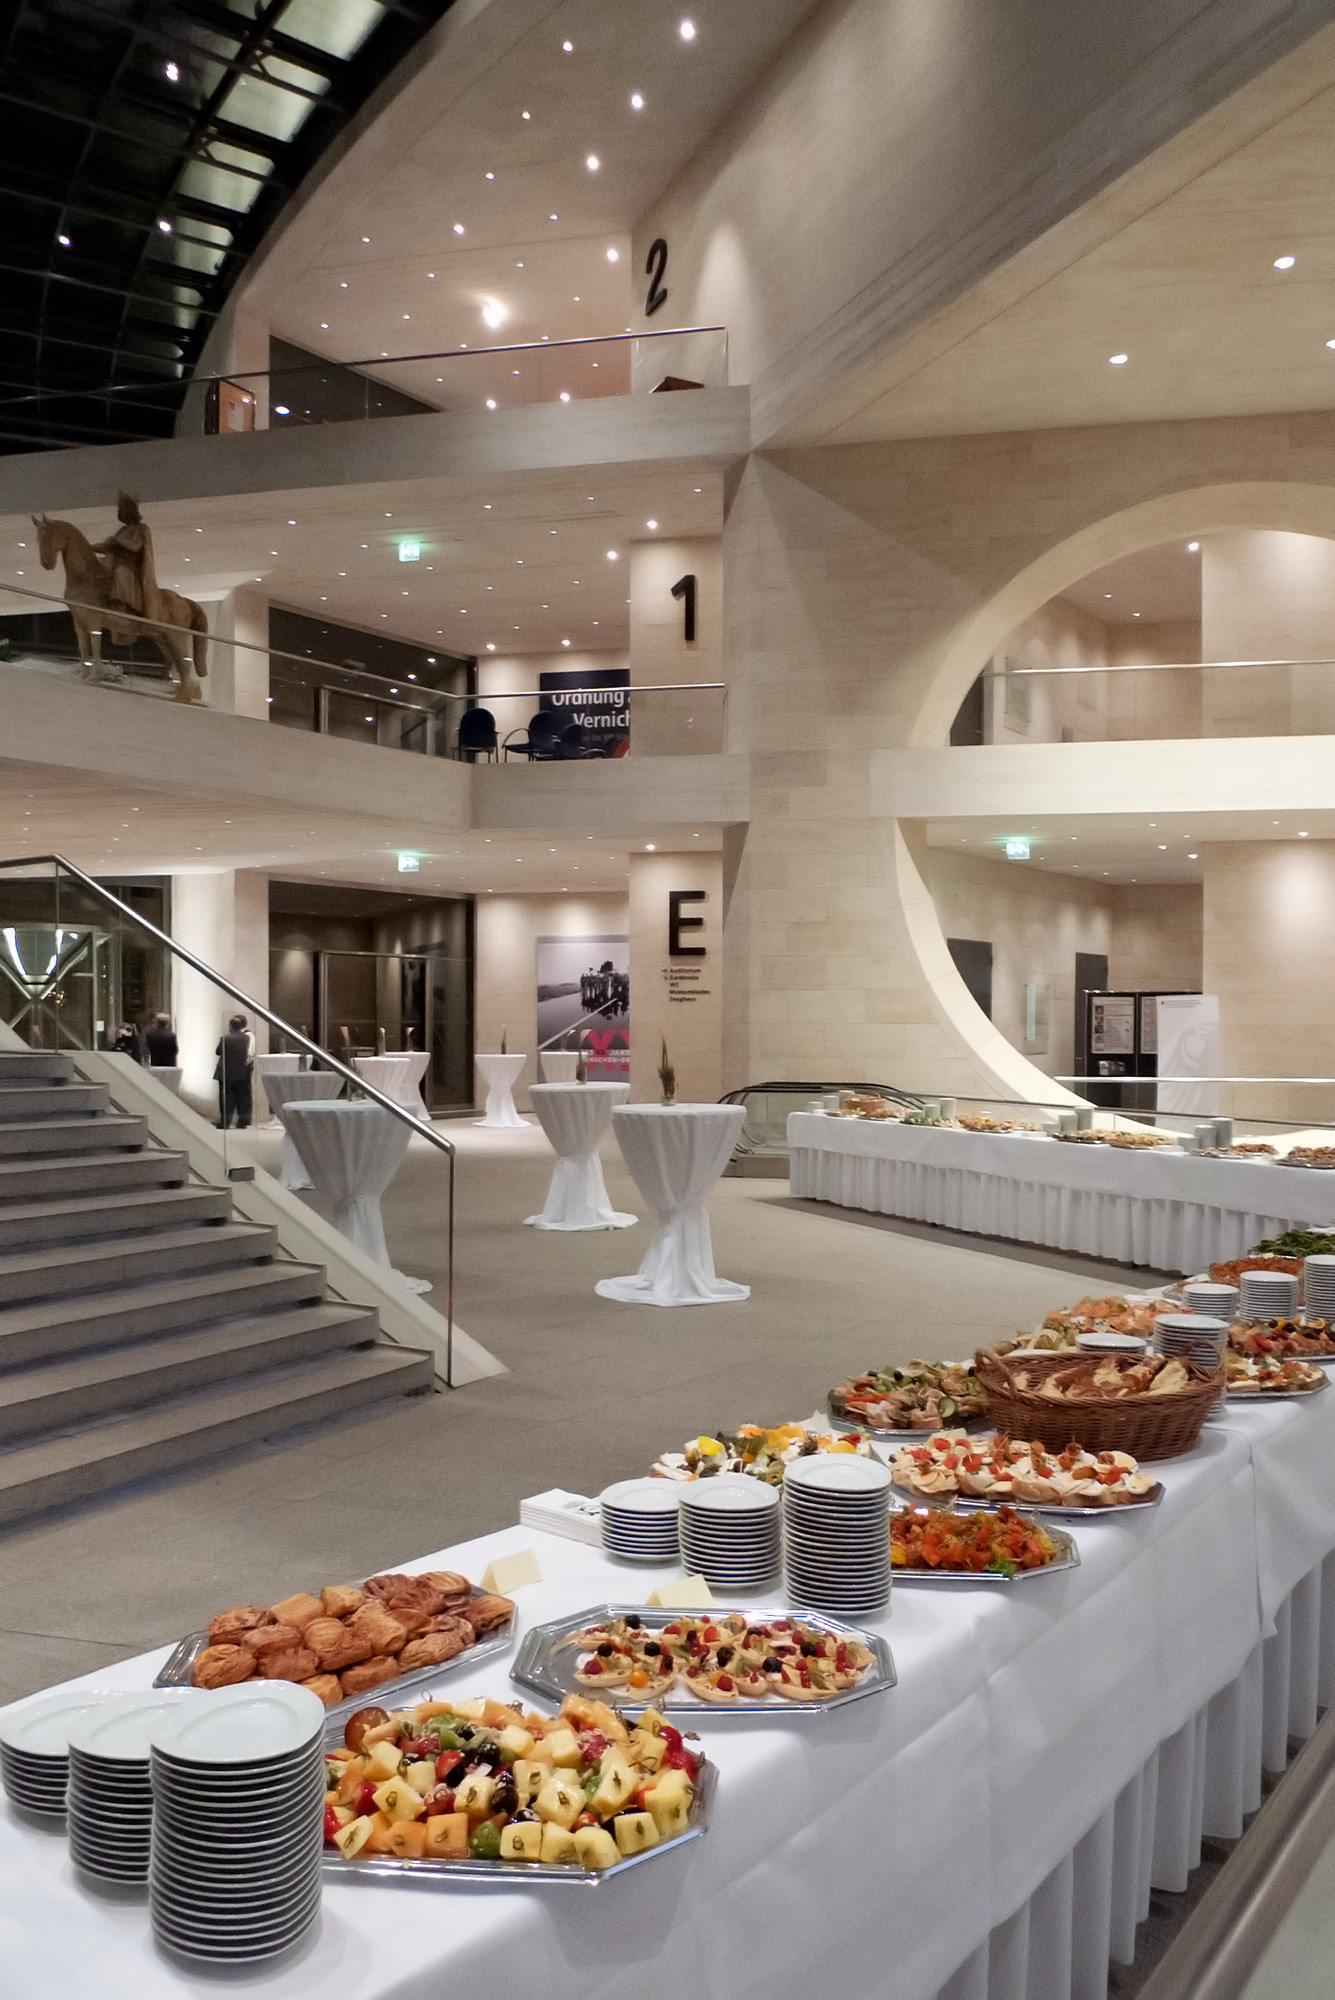 Amtseinführung Deutsches Historisches Museum - Butterstulle Catering Berlin